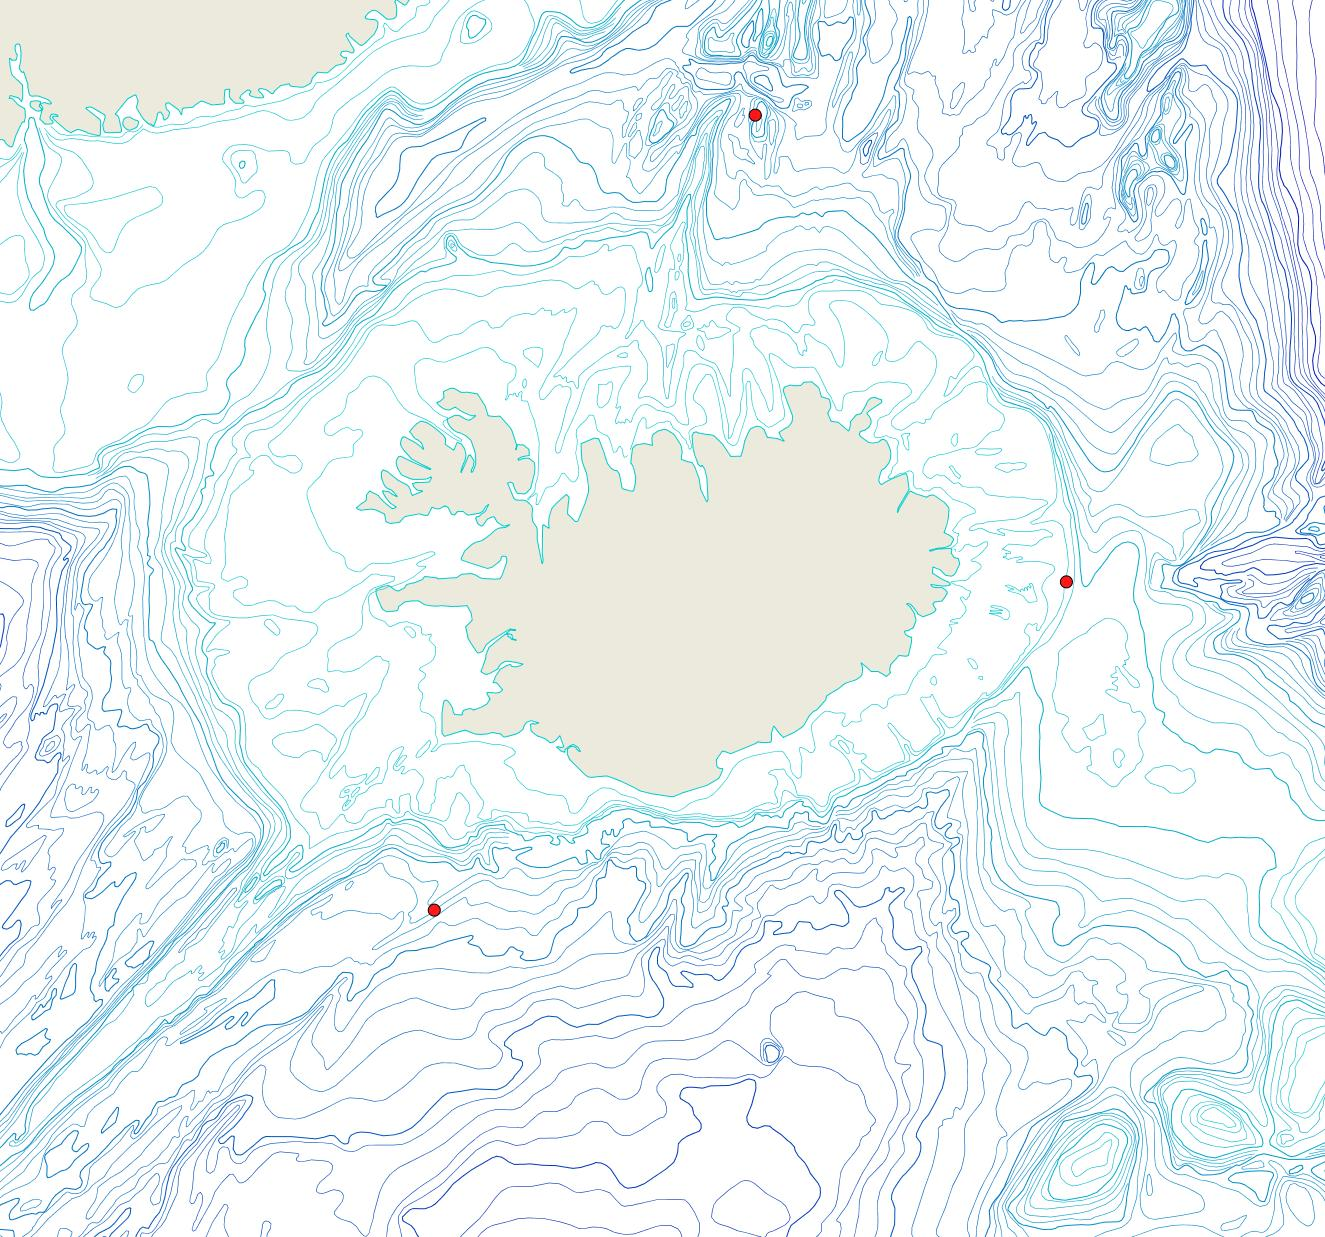 Útbreiðsla Escharella levinseni(Bioice samples, red dots)